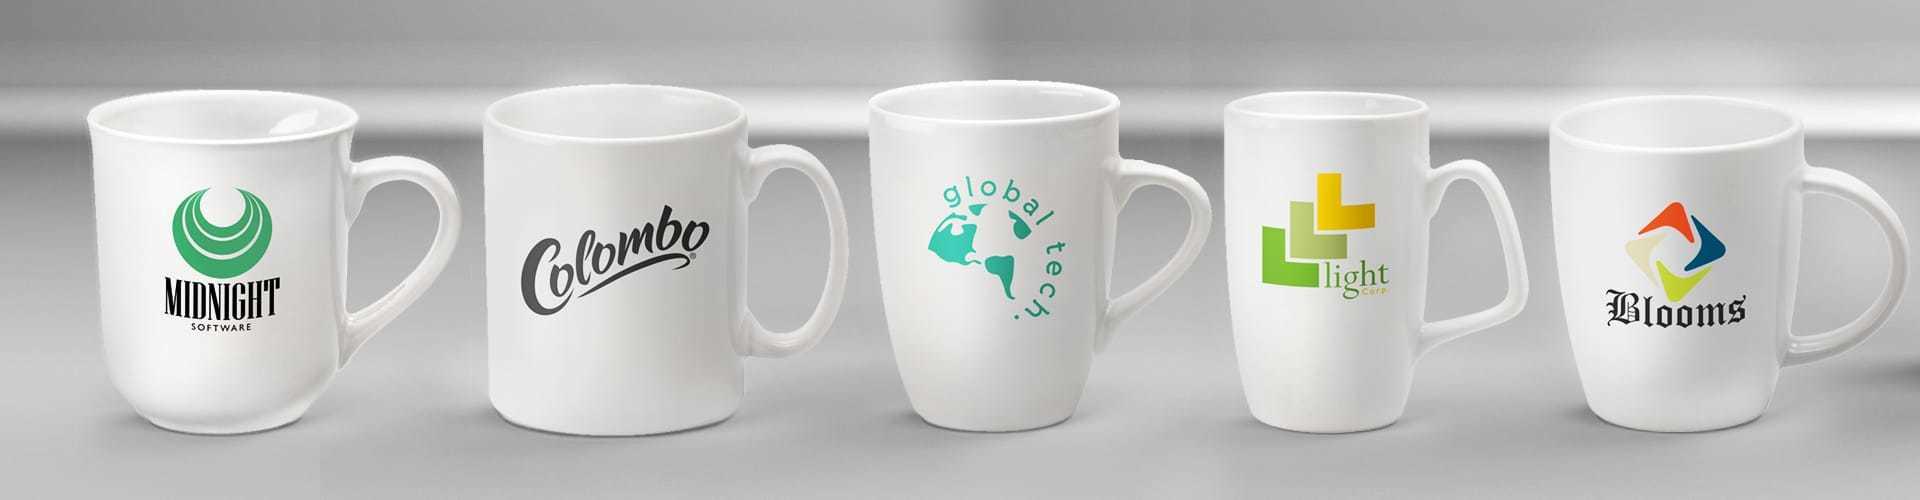 Terrific Mugs, Printed Mugs, Promotional Mugs